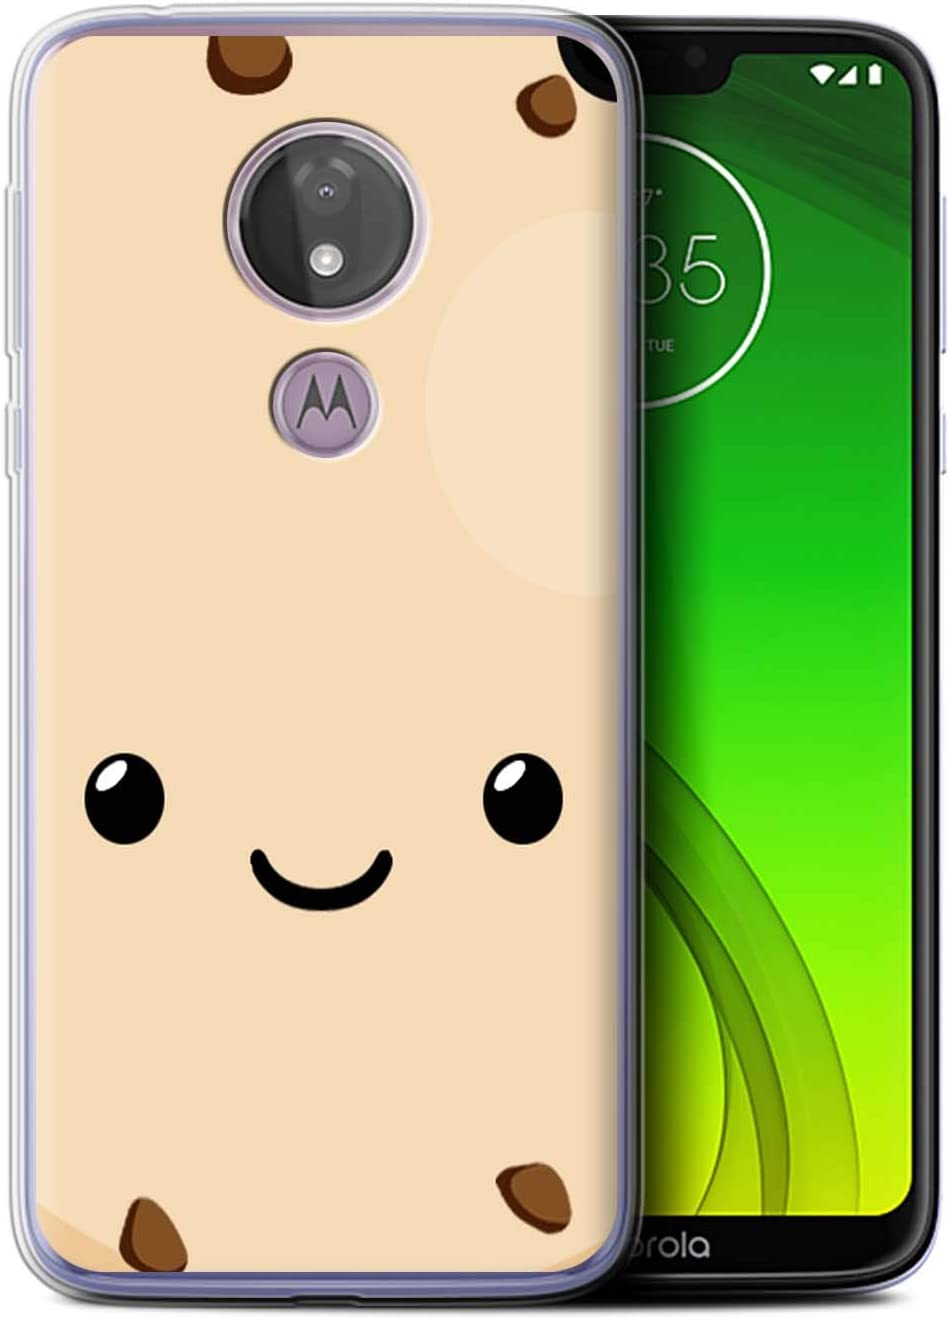 Phone Case for Motorola Moto G7 Power Kawaii Food Cookie Design Transparent Clear Ultra Soft Flexi Silicone Gel/TPU Bumper Cover